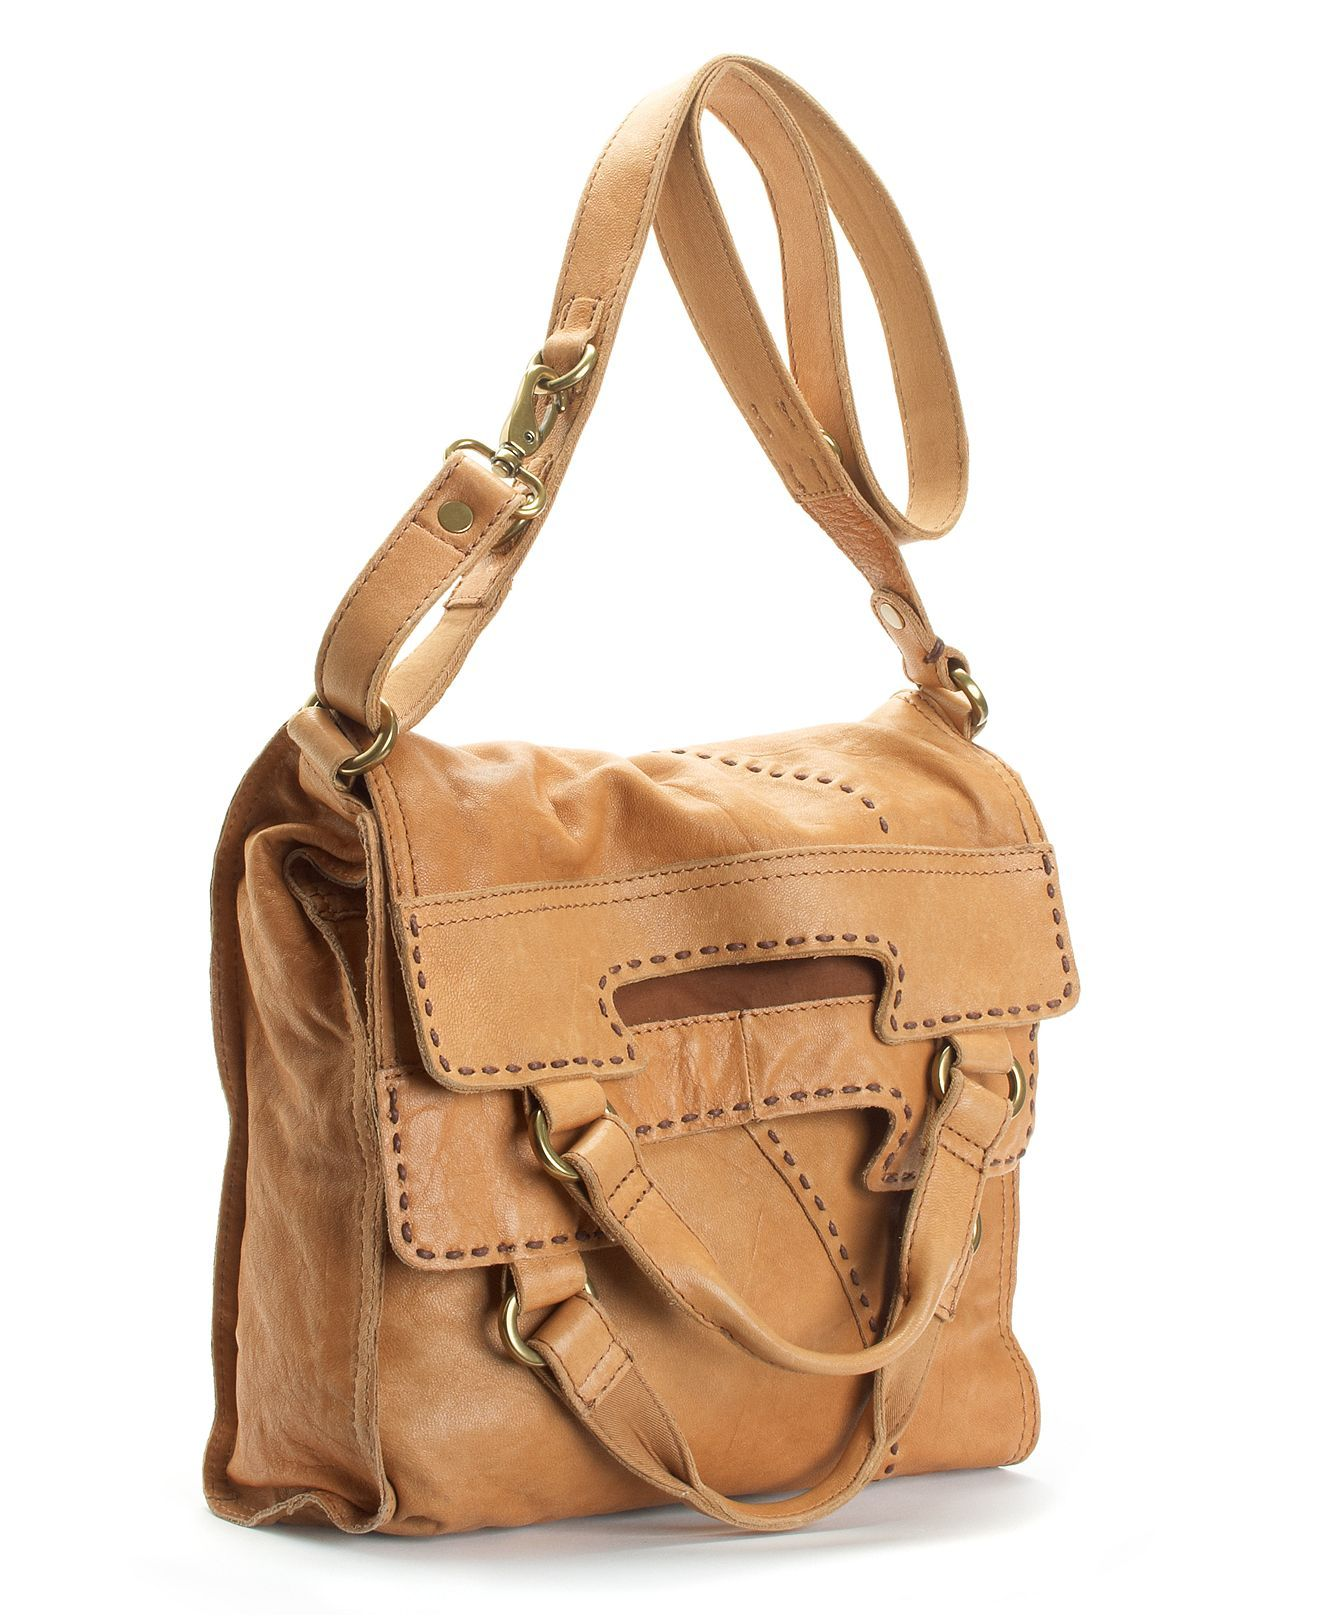 Lucky Brand Handbag Abbey Road Leather Bag Handbags Accessories Macy S